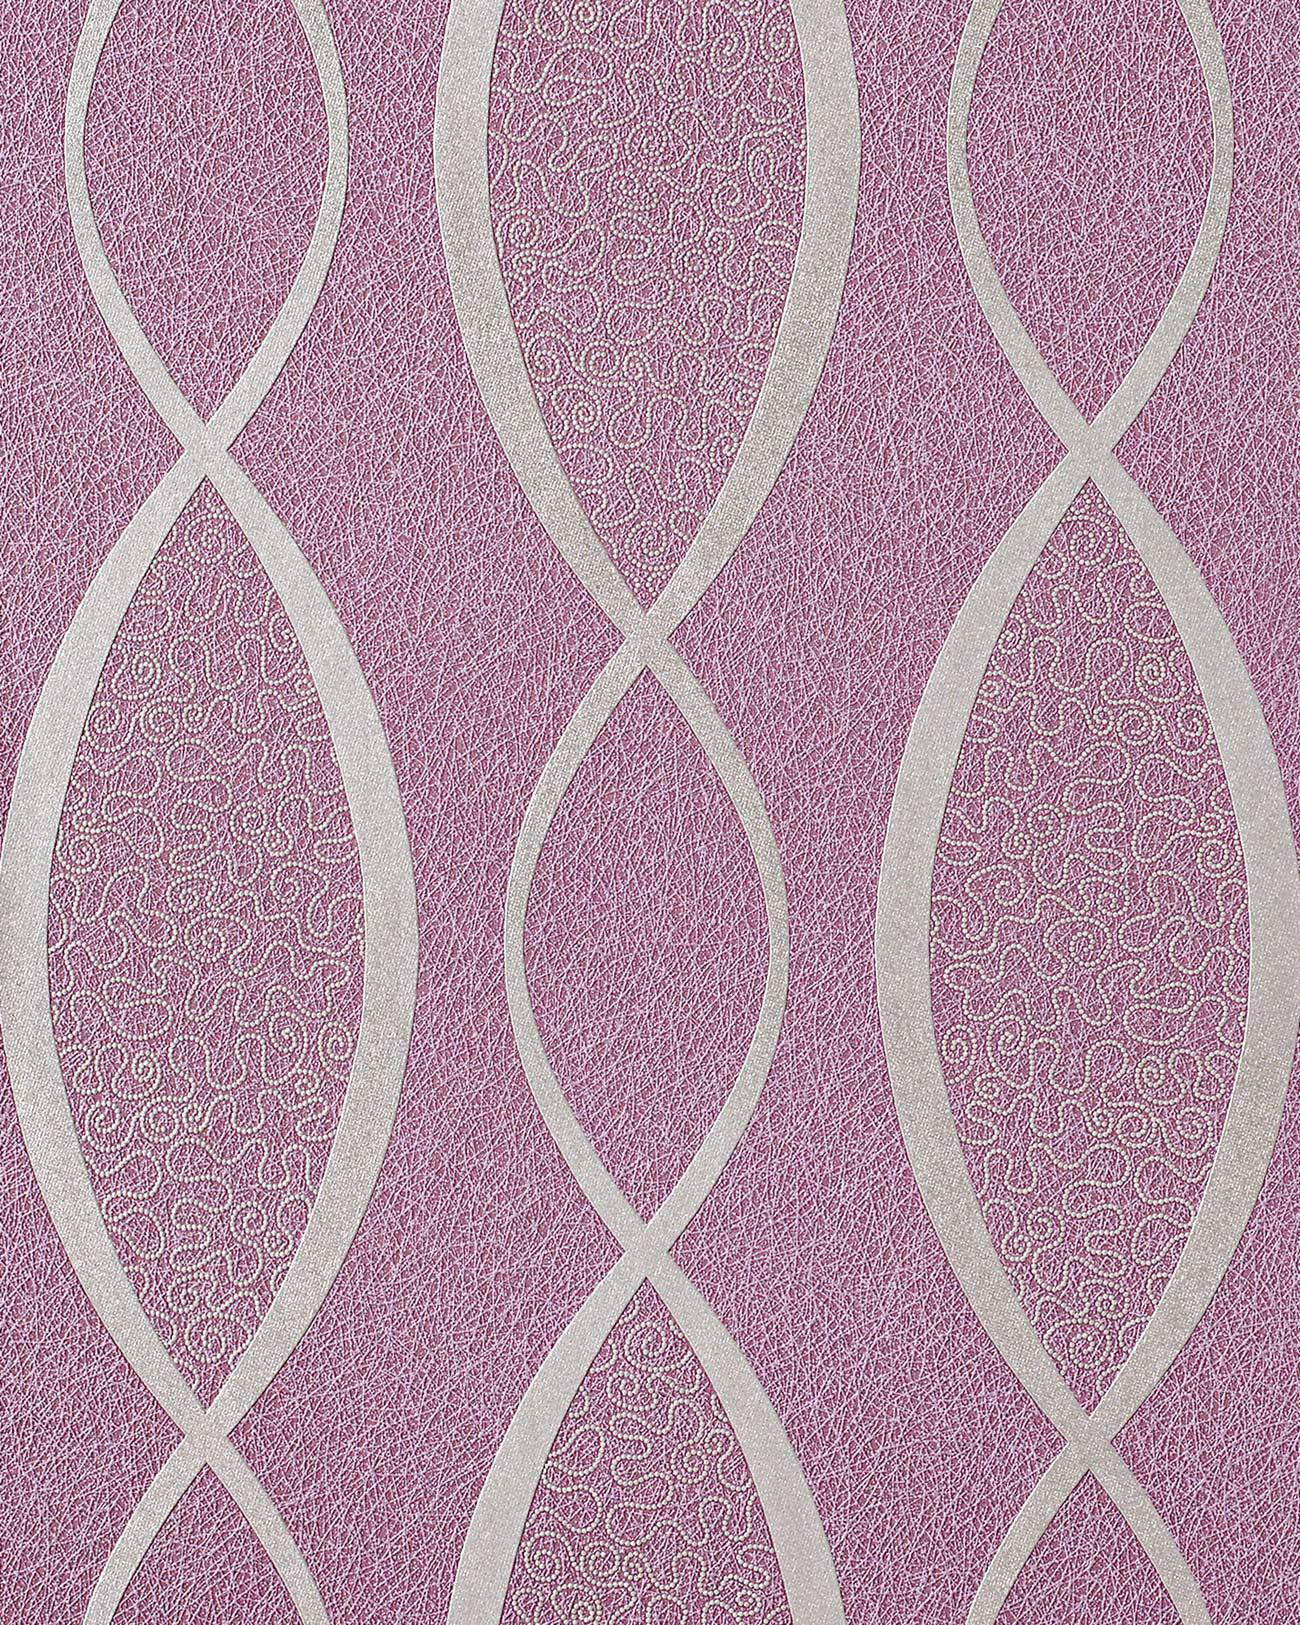 retro tapete edem 1018 14 retrotapete geschwungene linien. Black Bedroom Furniture Sets. Home Design Ideas